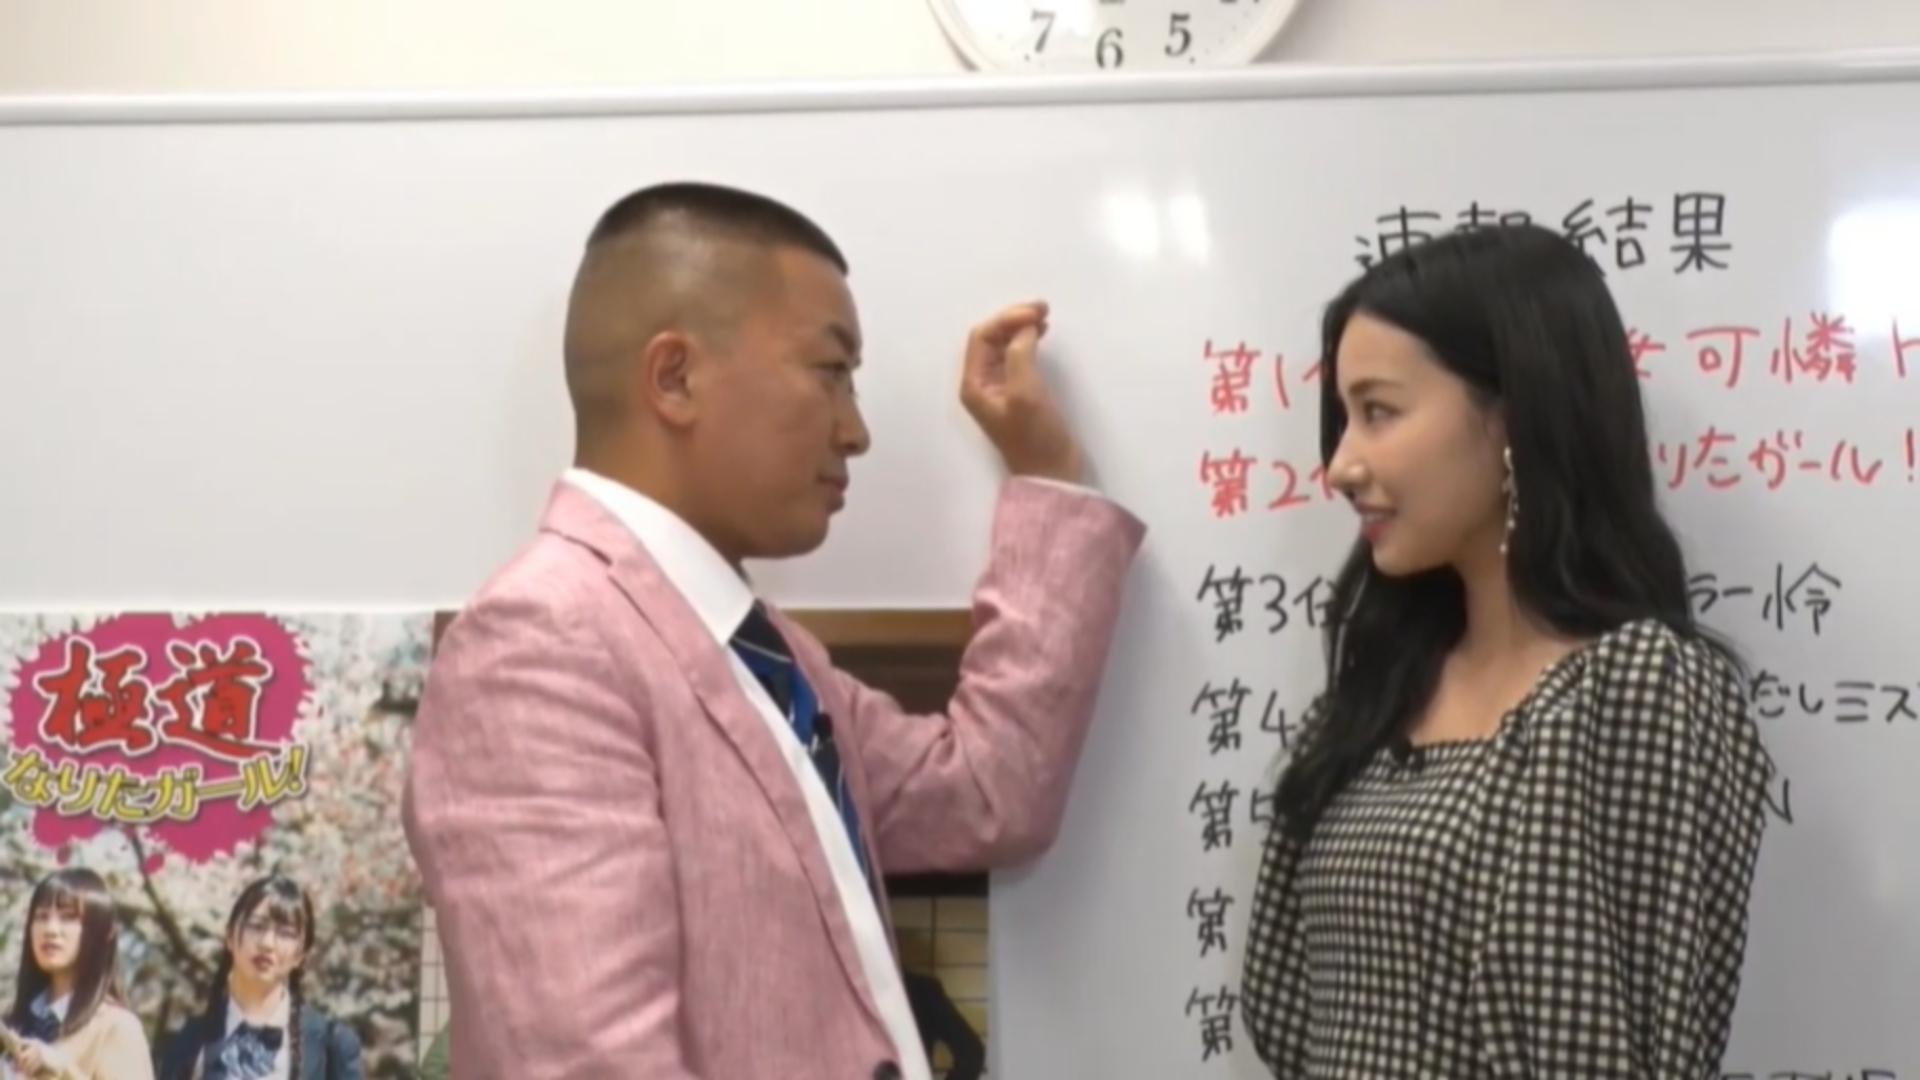 【NMB48】第1話特別企画の「第2話」作成は「ヒーロー少女 可憐Flower」と「極道なりたガール!」に決定